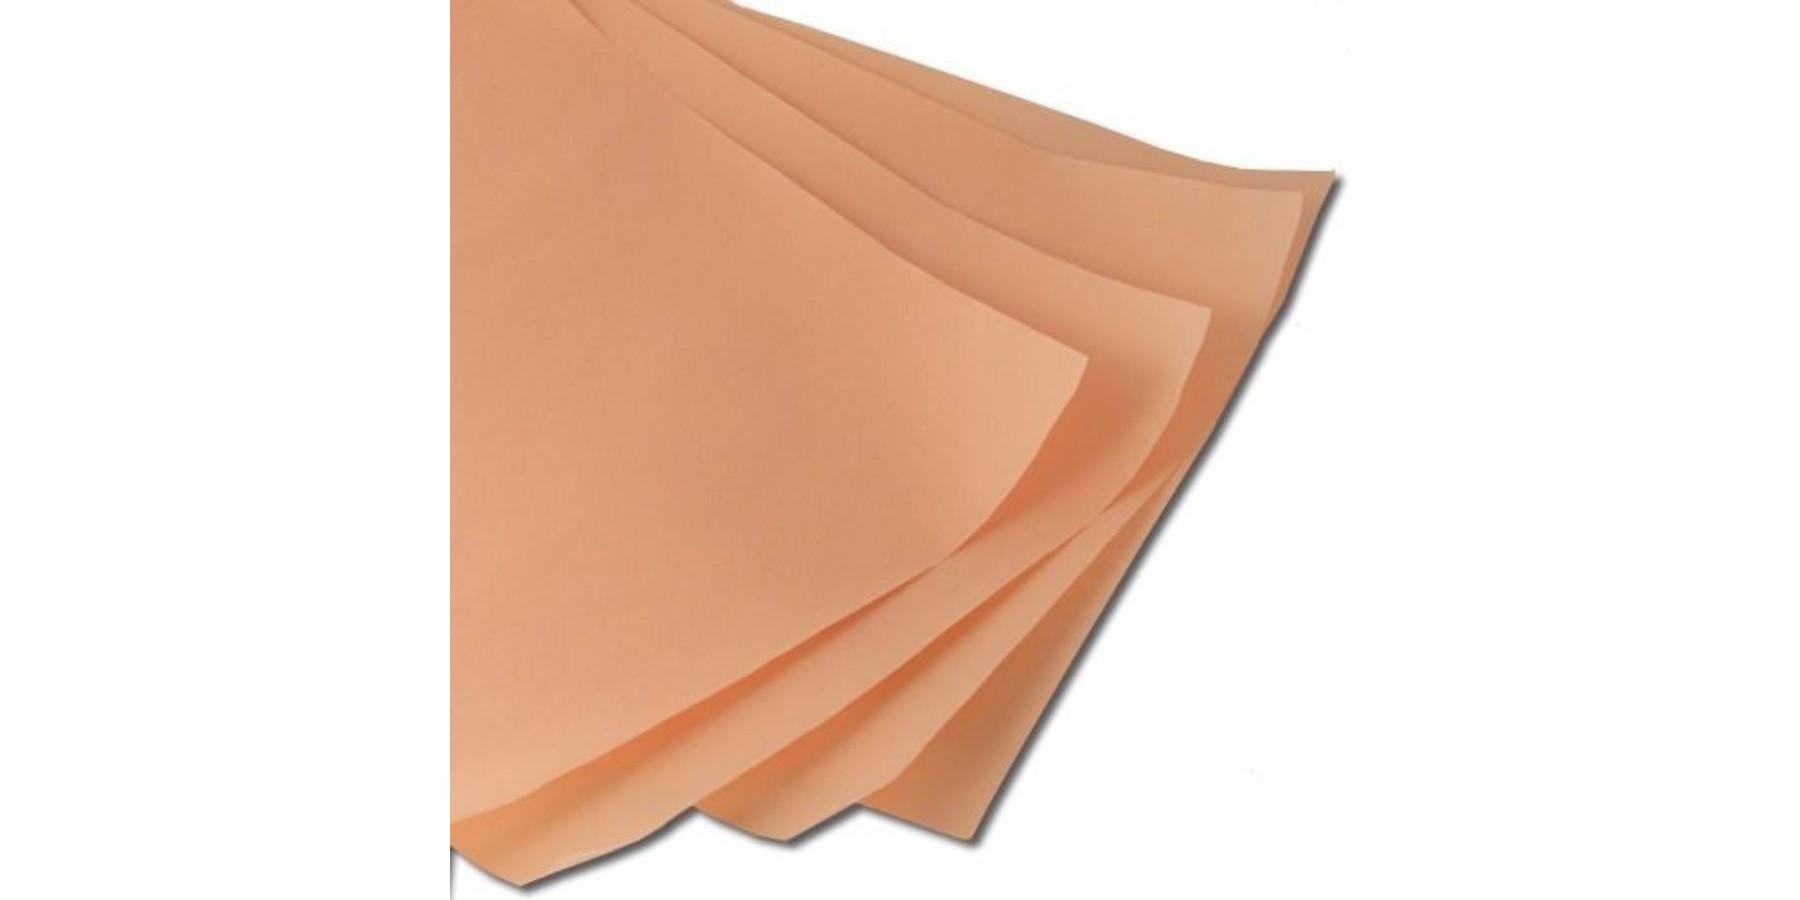 Butcher paper 40 x 60 cm